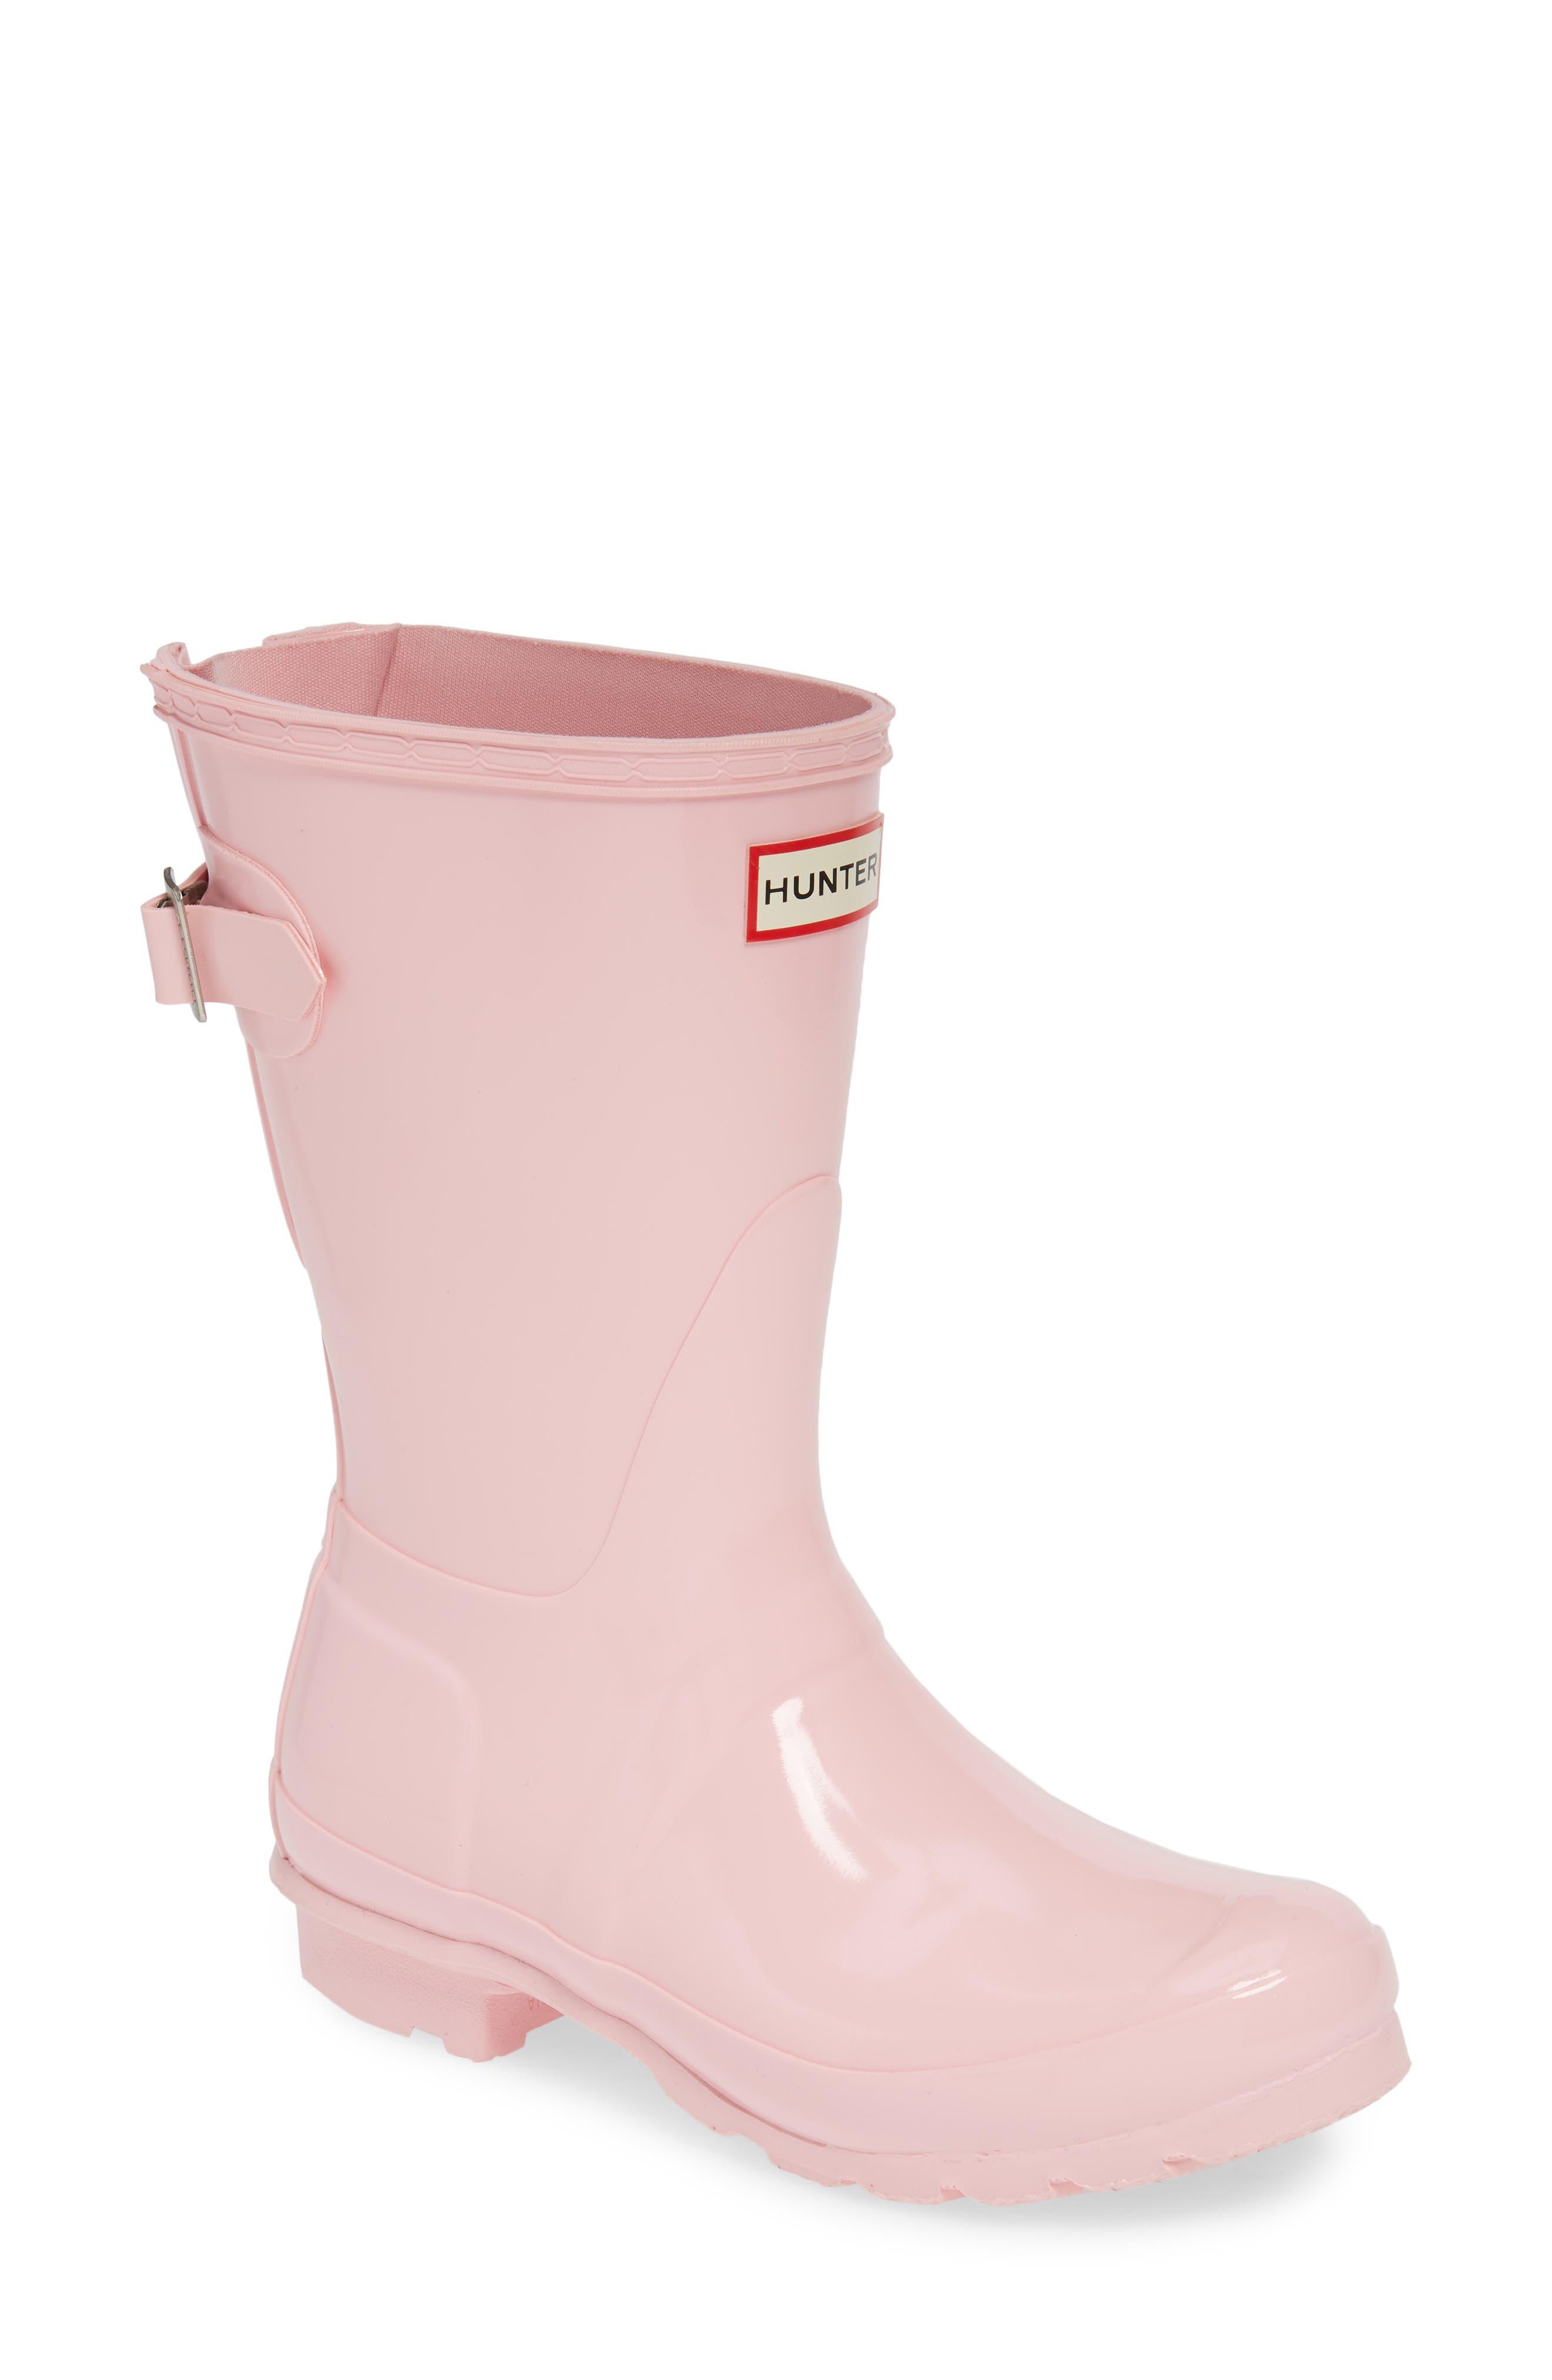 HUNTER,                             Original Short Adjustable Back Gloss Waterproof Rain Boot,                             Main thumbnail 1, color,                             CANDY FLOSS RUBBER